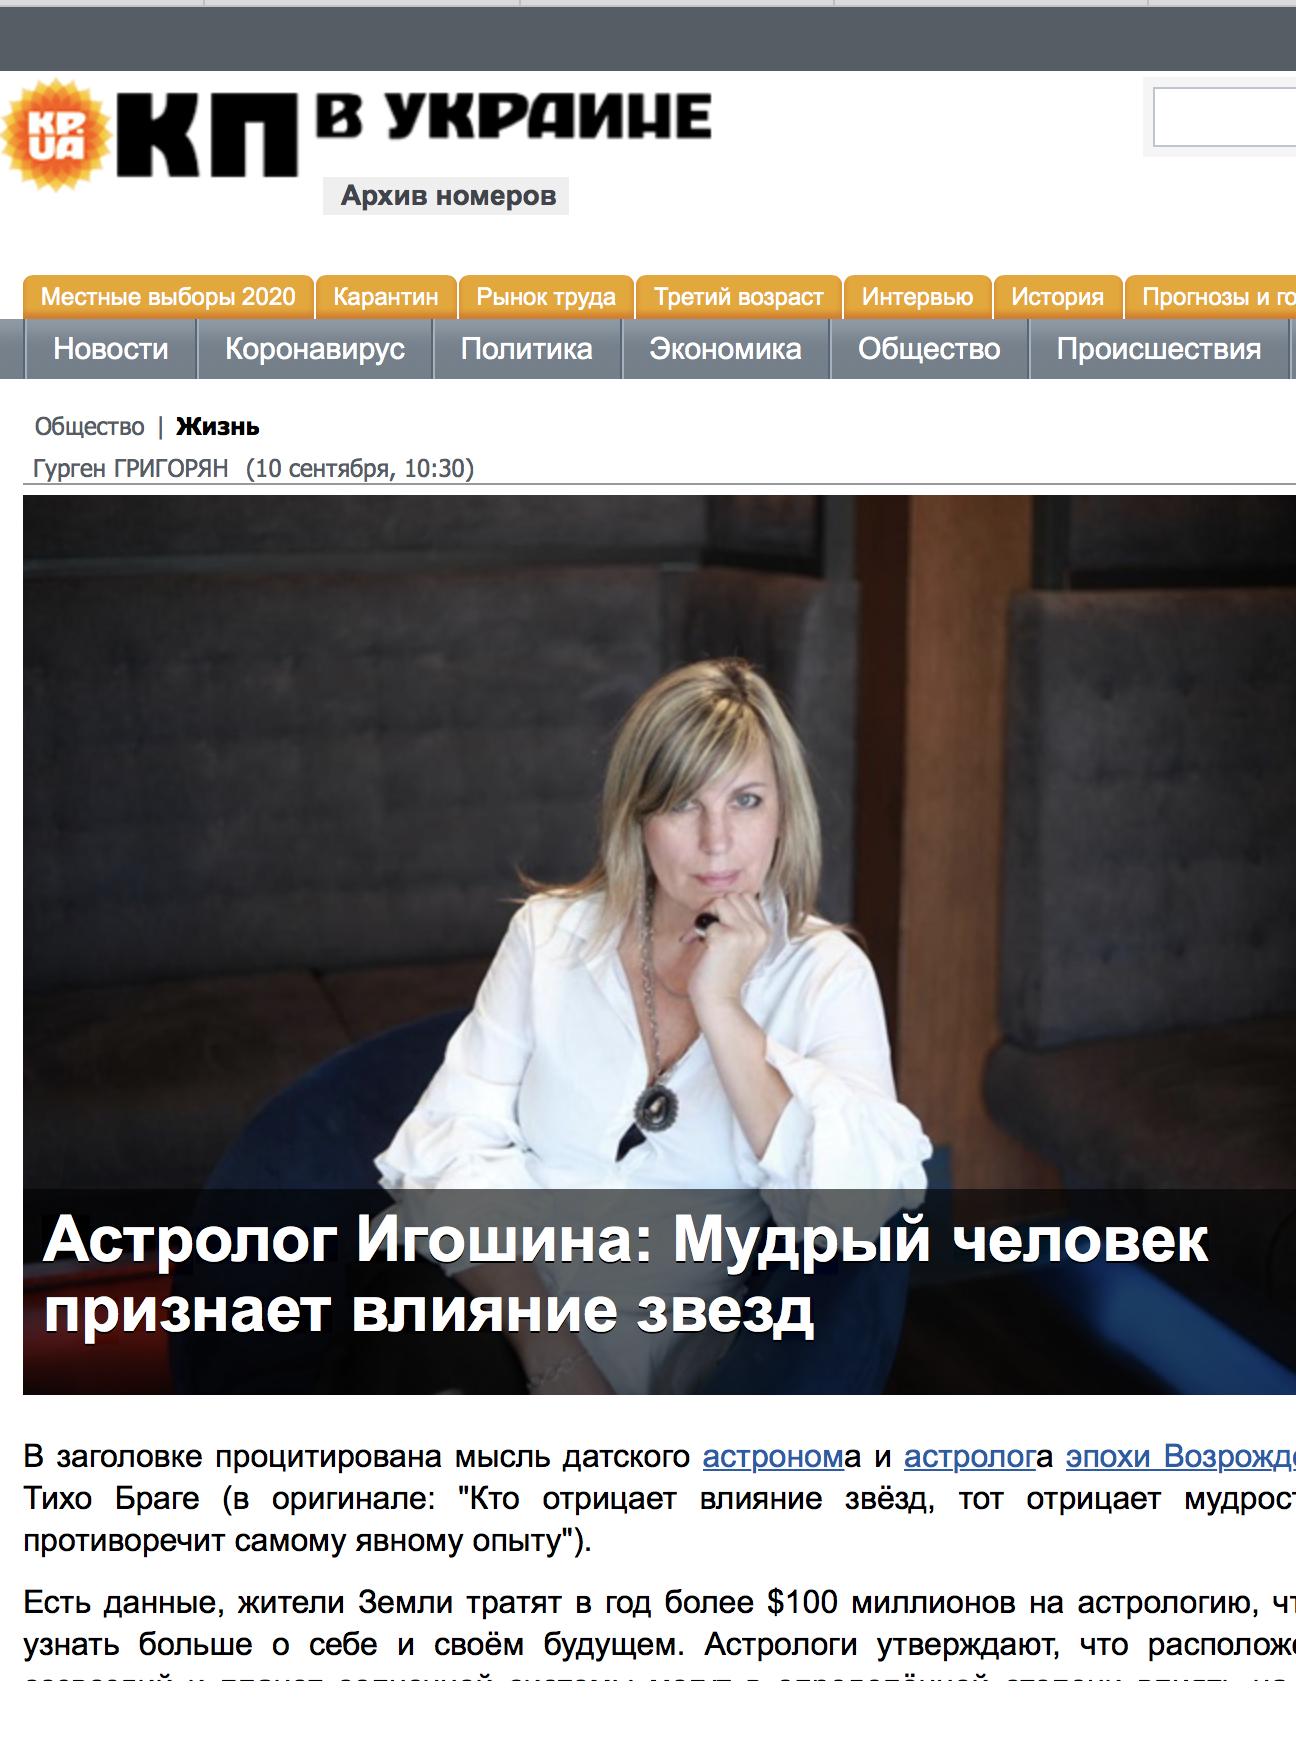 https://astrologtasha.ru/wp-content/uploads/2020/10/Screen-Shot-2020-10-08-at-15.49.41.png